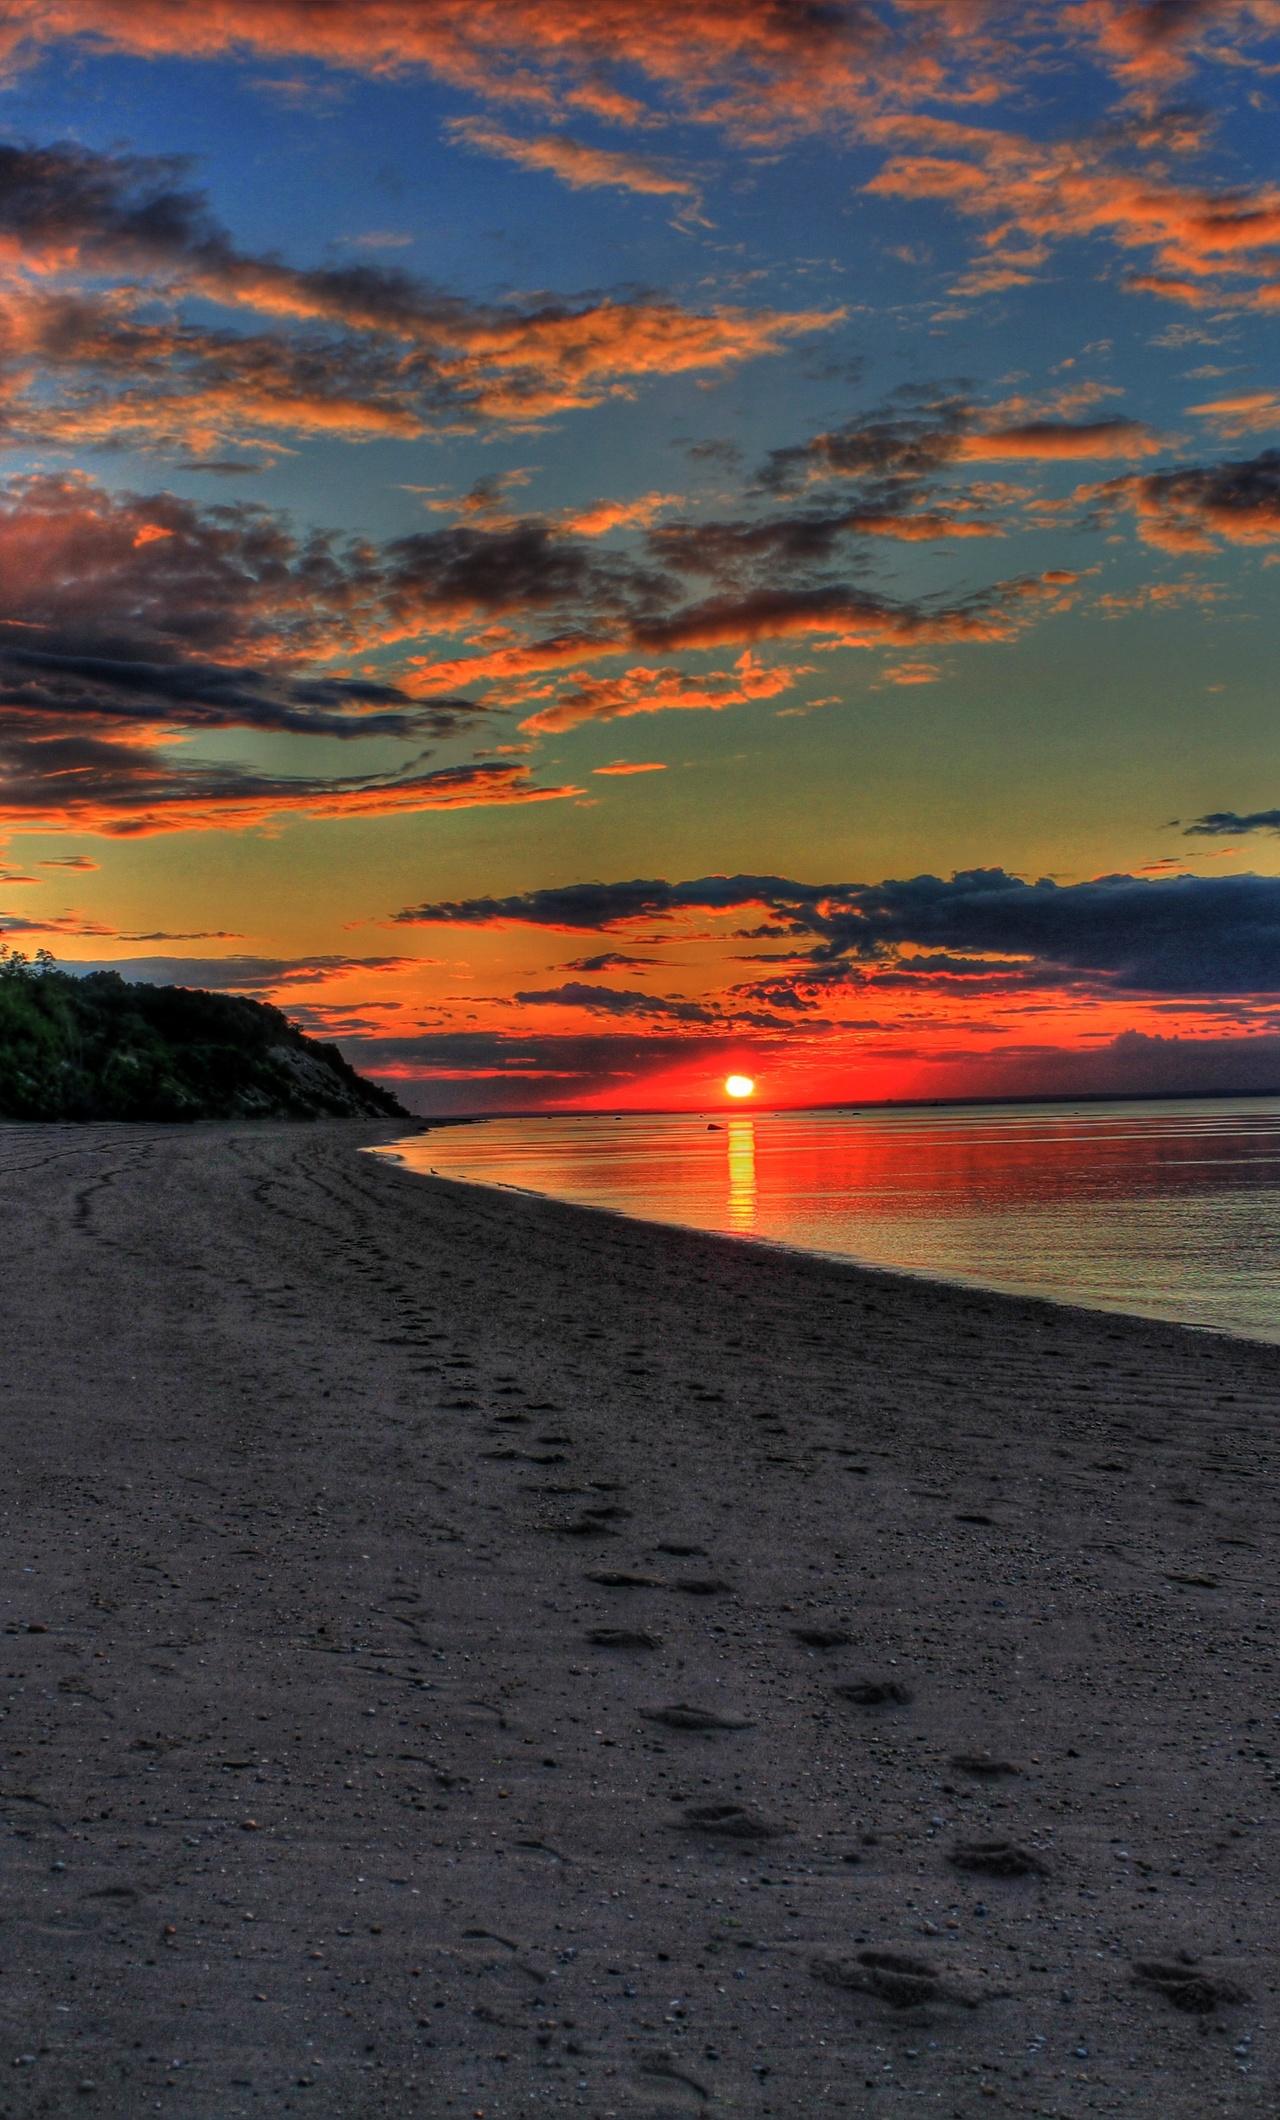 1280x2120 Sunset Island 5k iPhone 6+ HD 4k Wallpapers ...